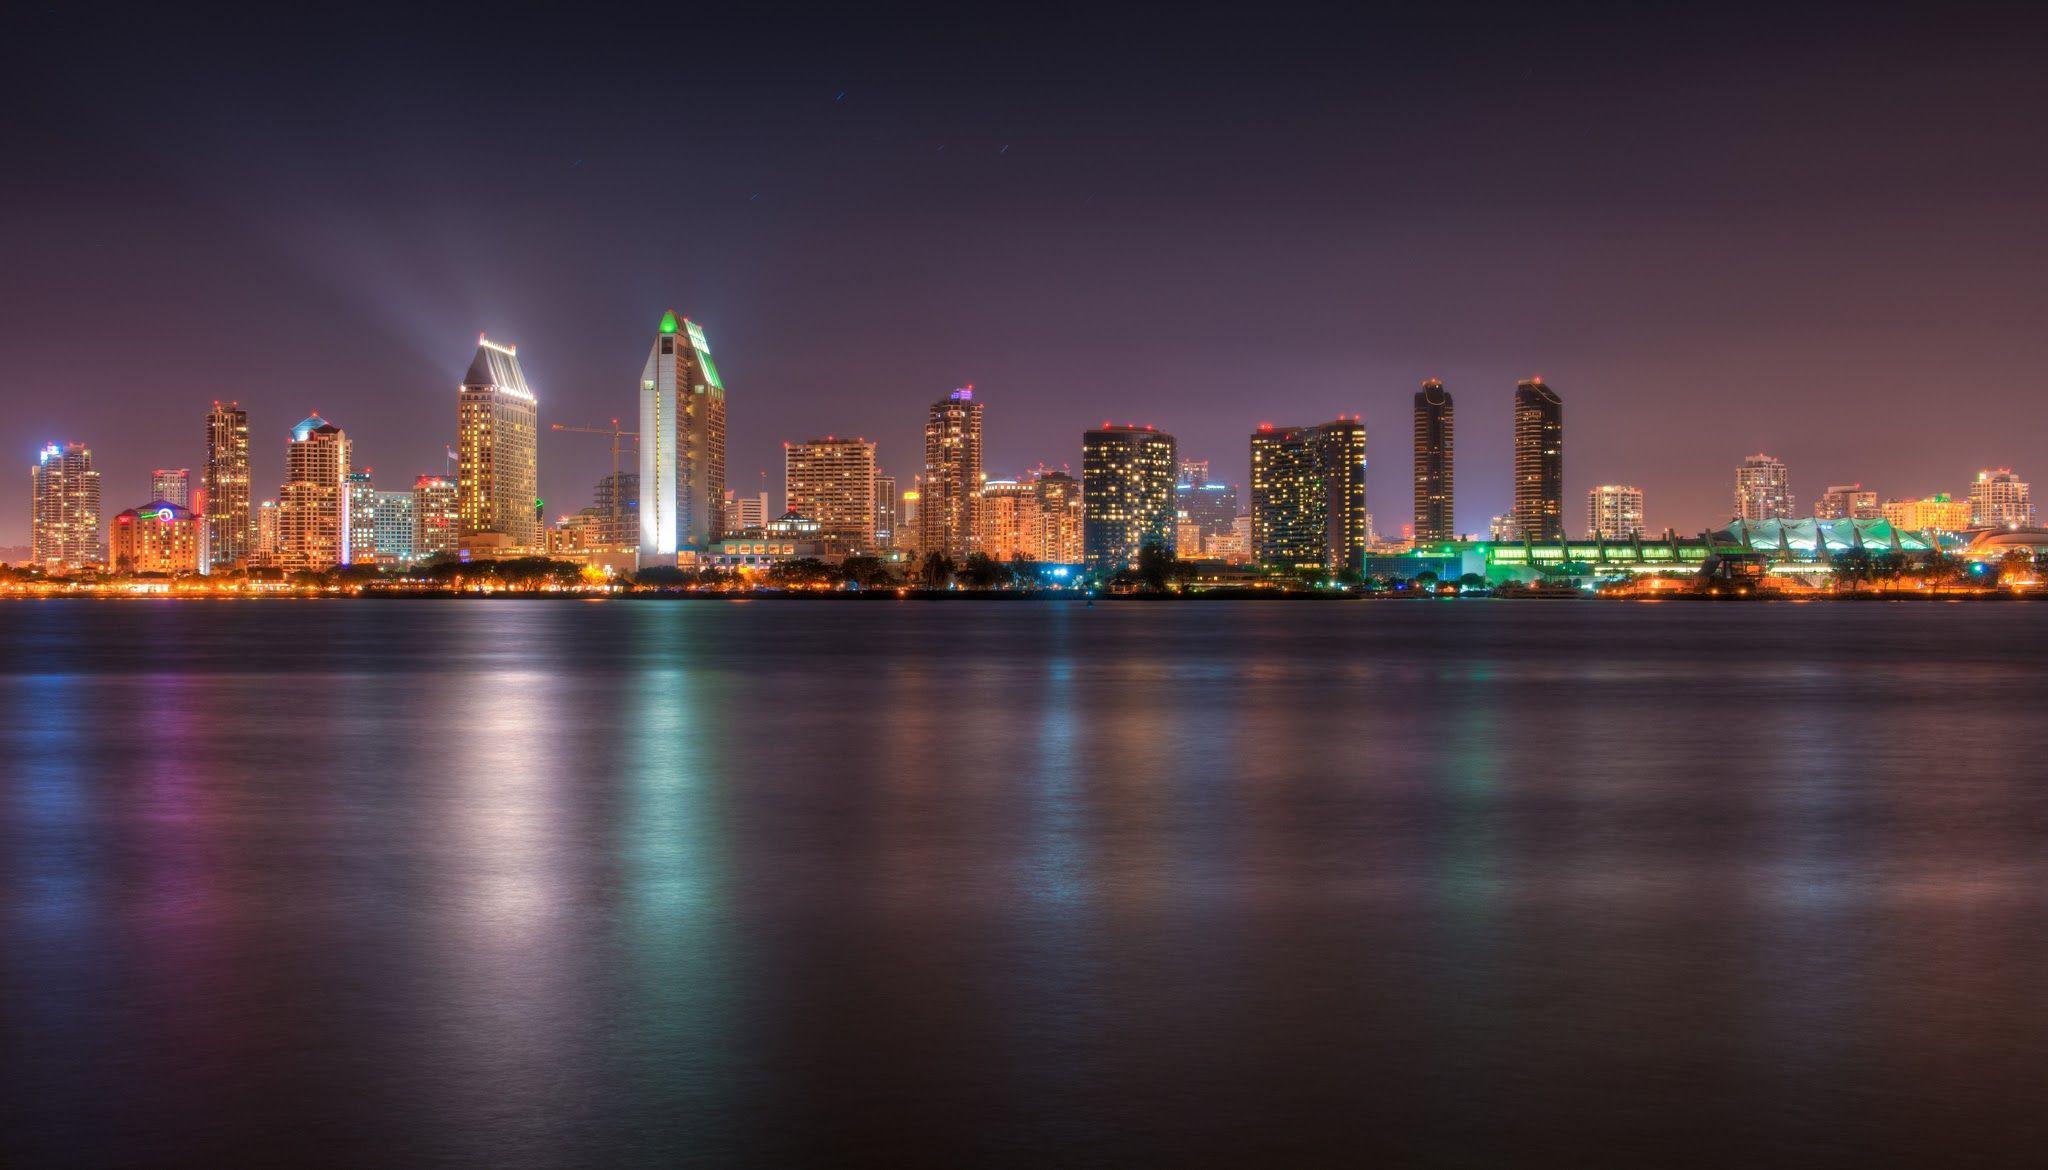 San Diego Skyline Widescreen HD Wallpaper Cityscape